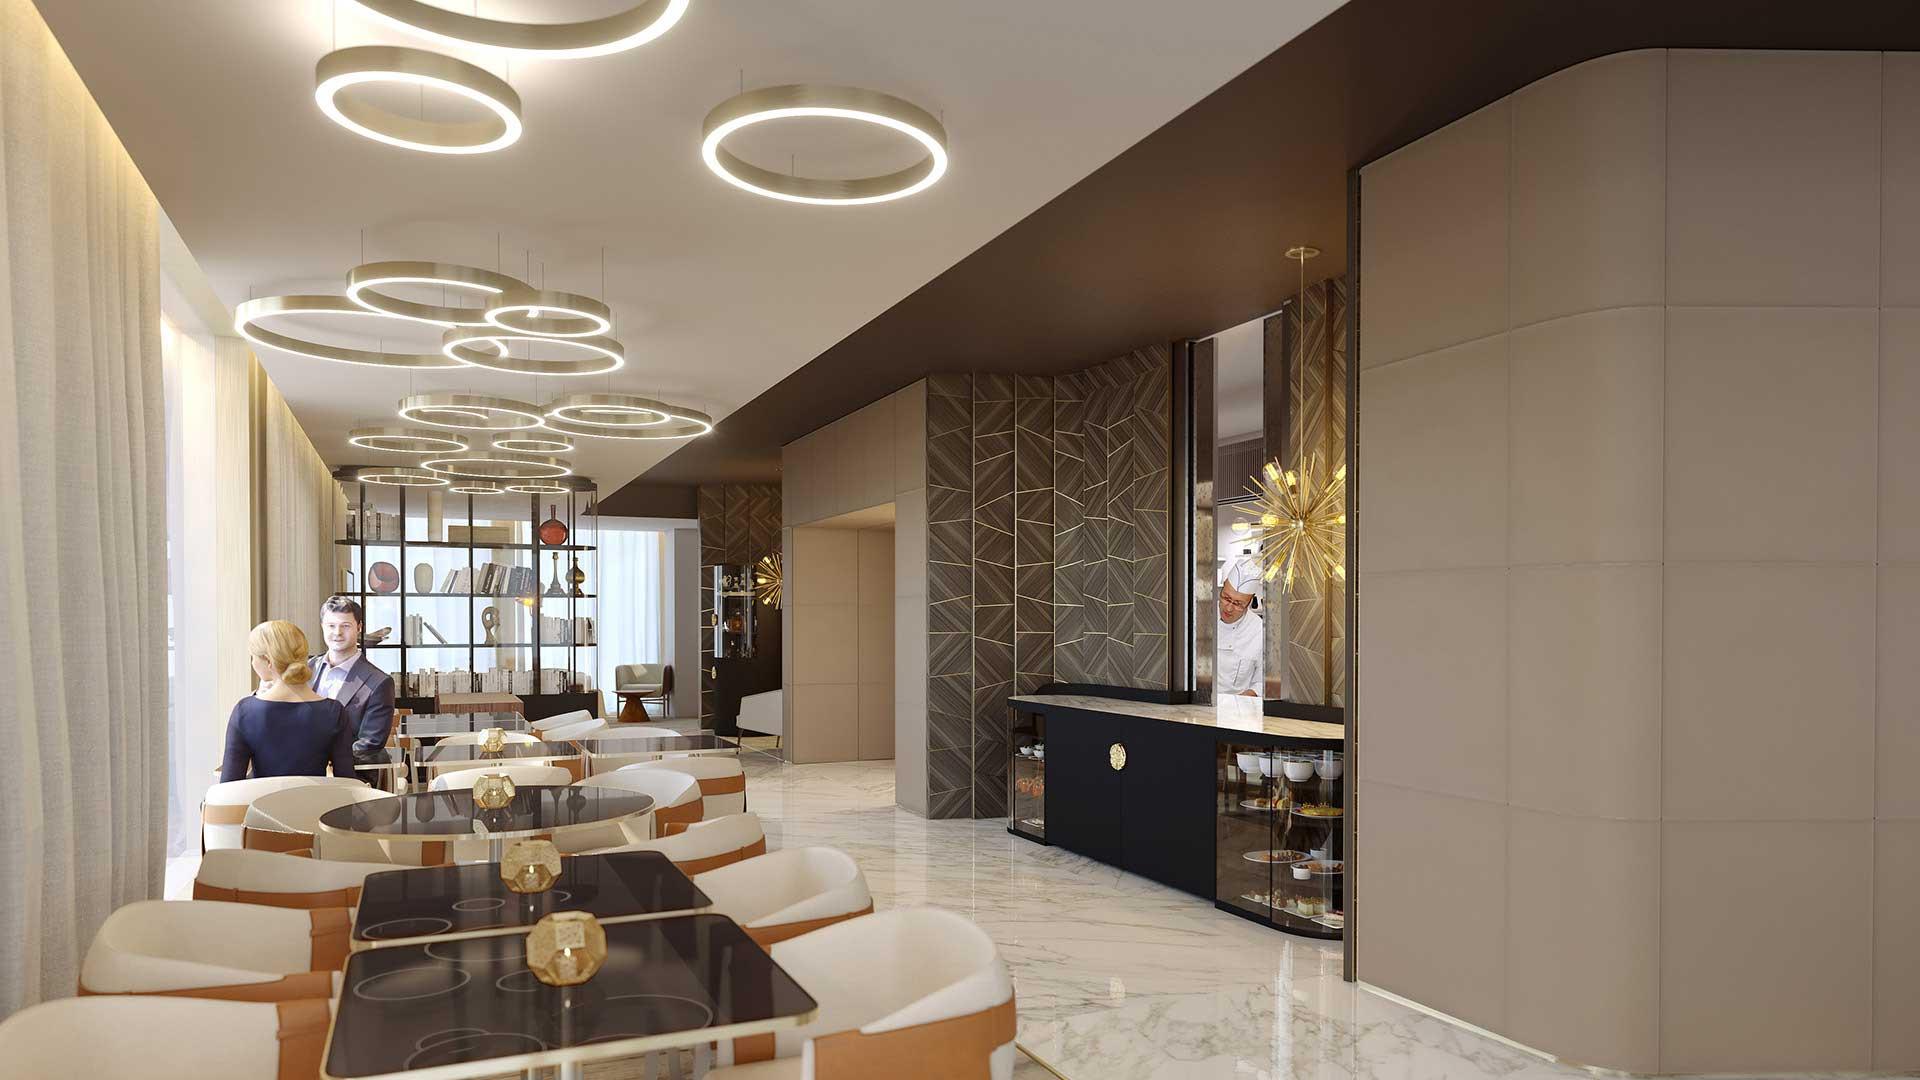 Concours d perspective restaurant de luxe image synthèse